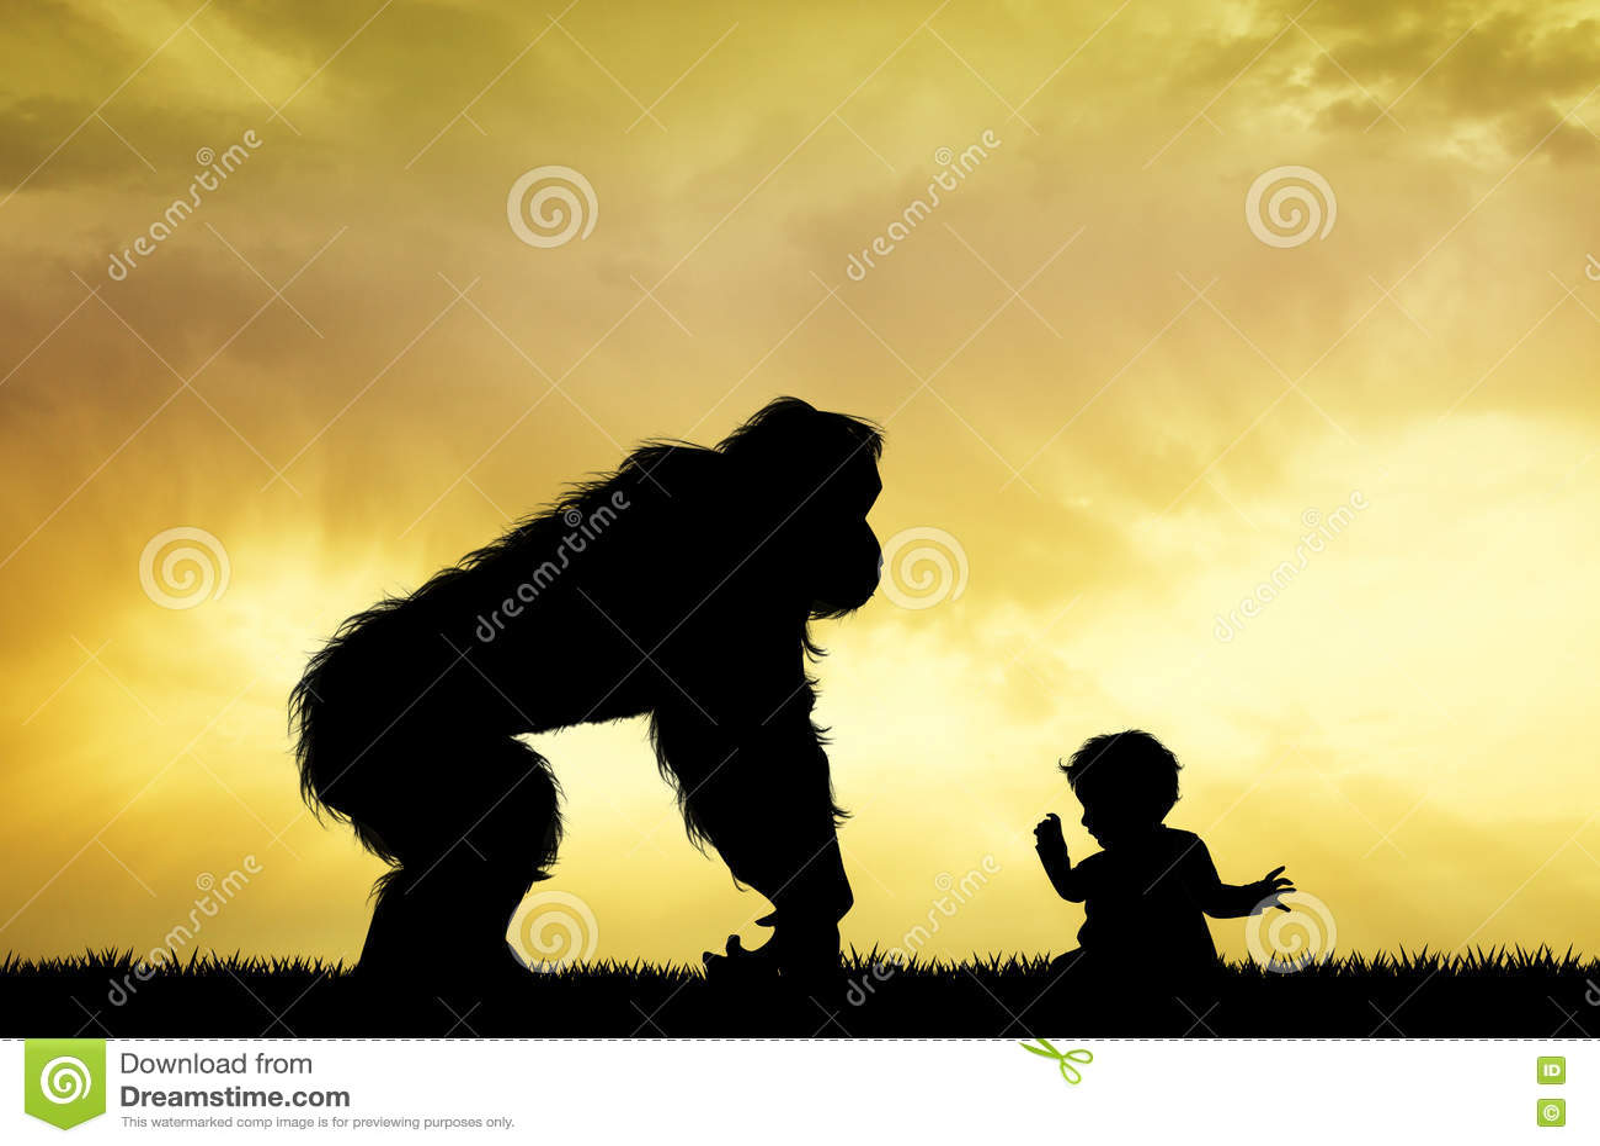 Gorilla with child